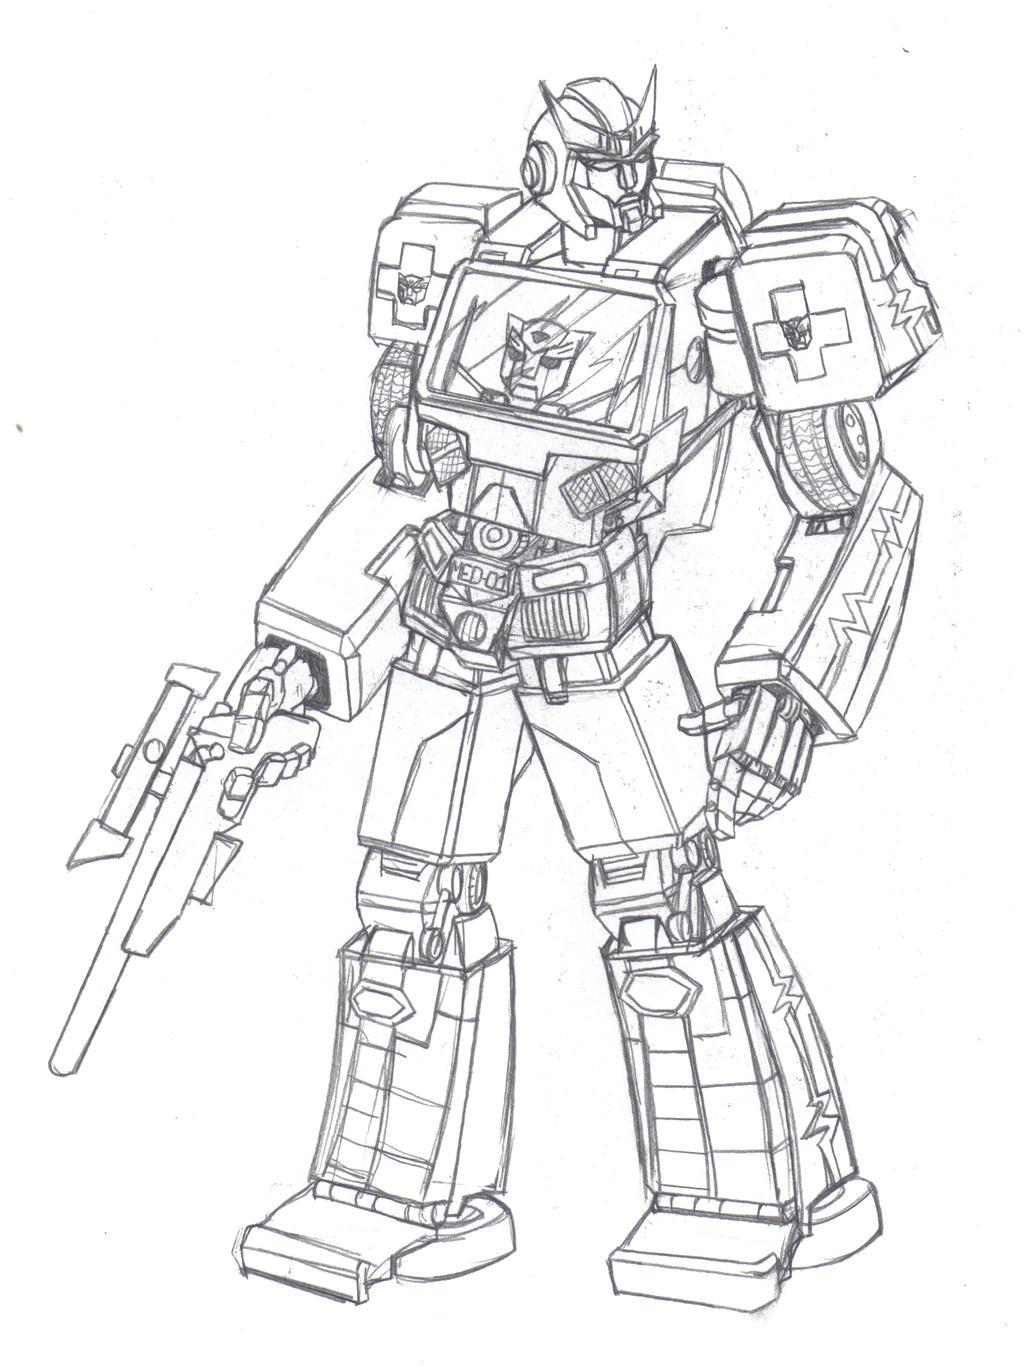 Autobot Recon Ratchet By Chaoslanternxxx On Deviantart